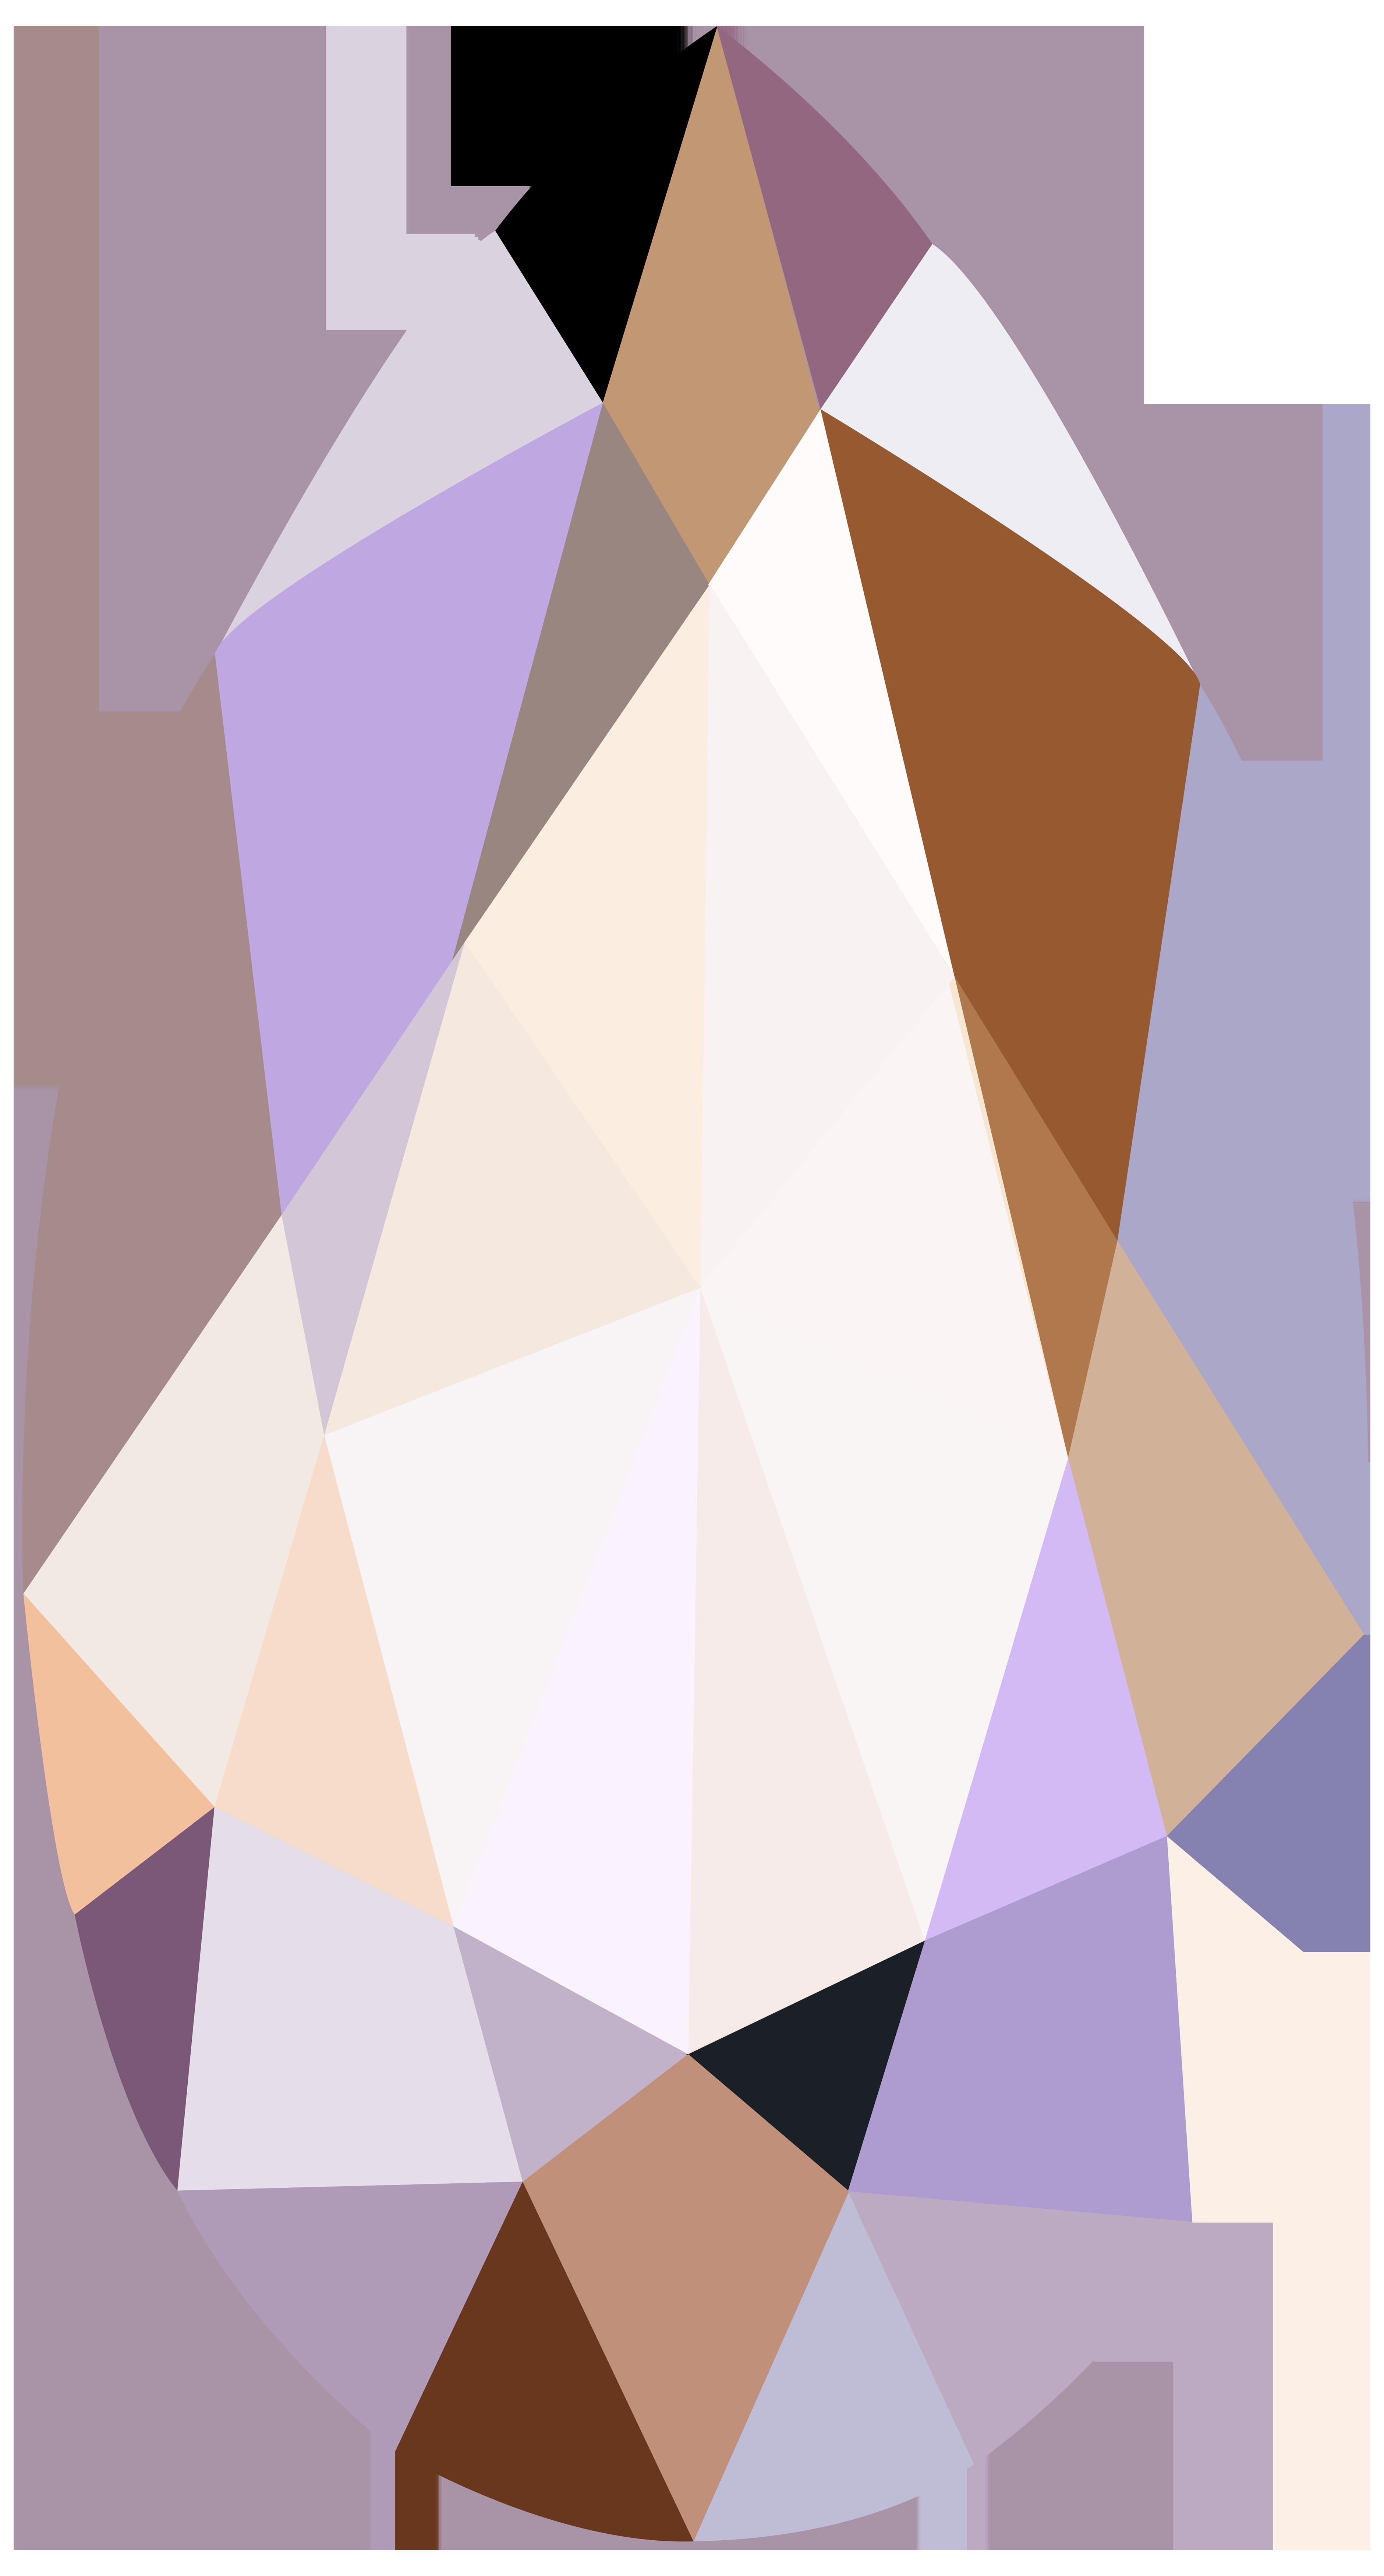 Gems clipart purple diamond Full Gem Art Yopriceville High